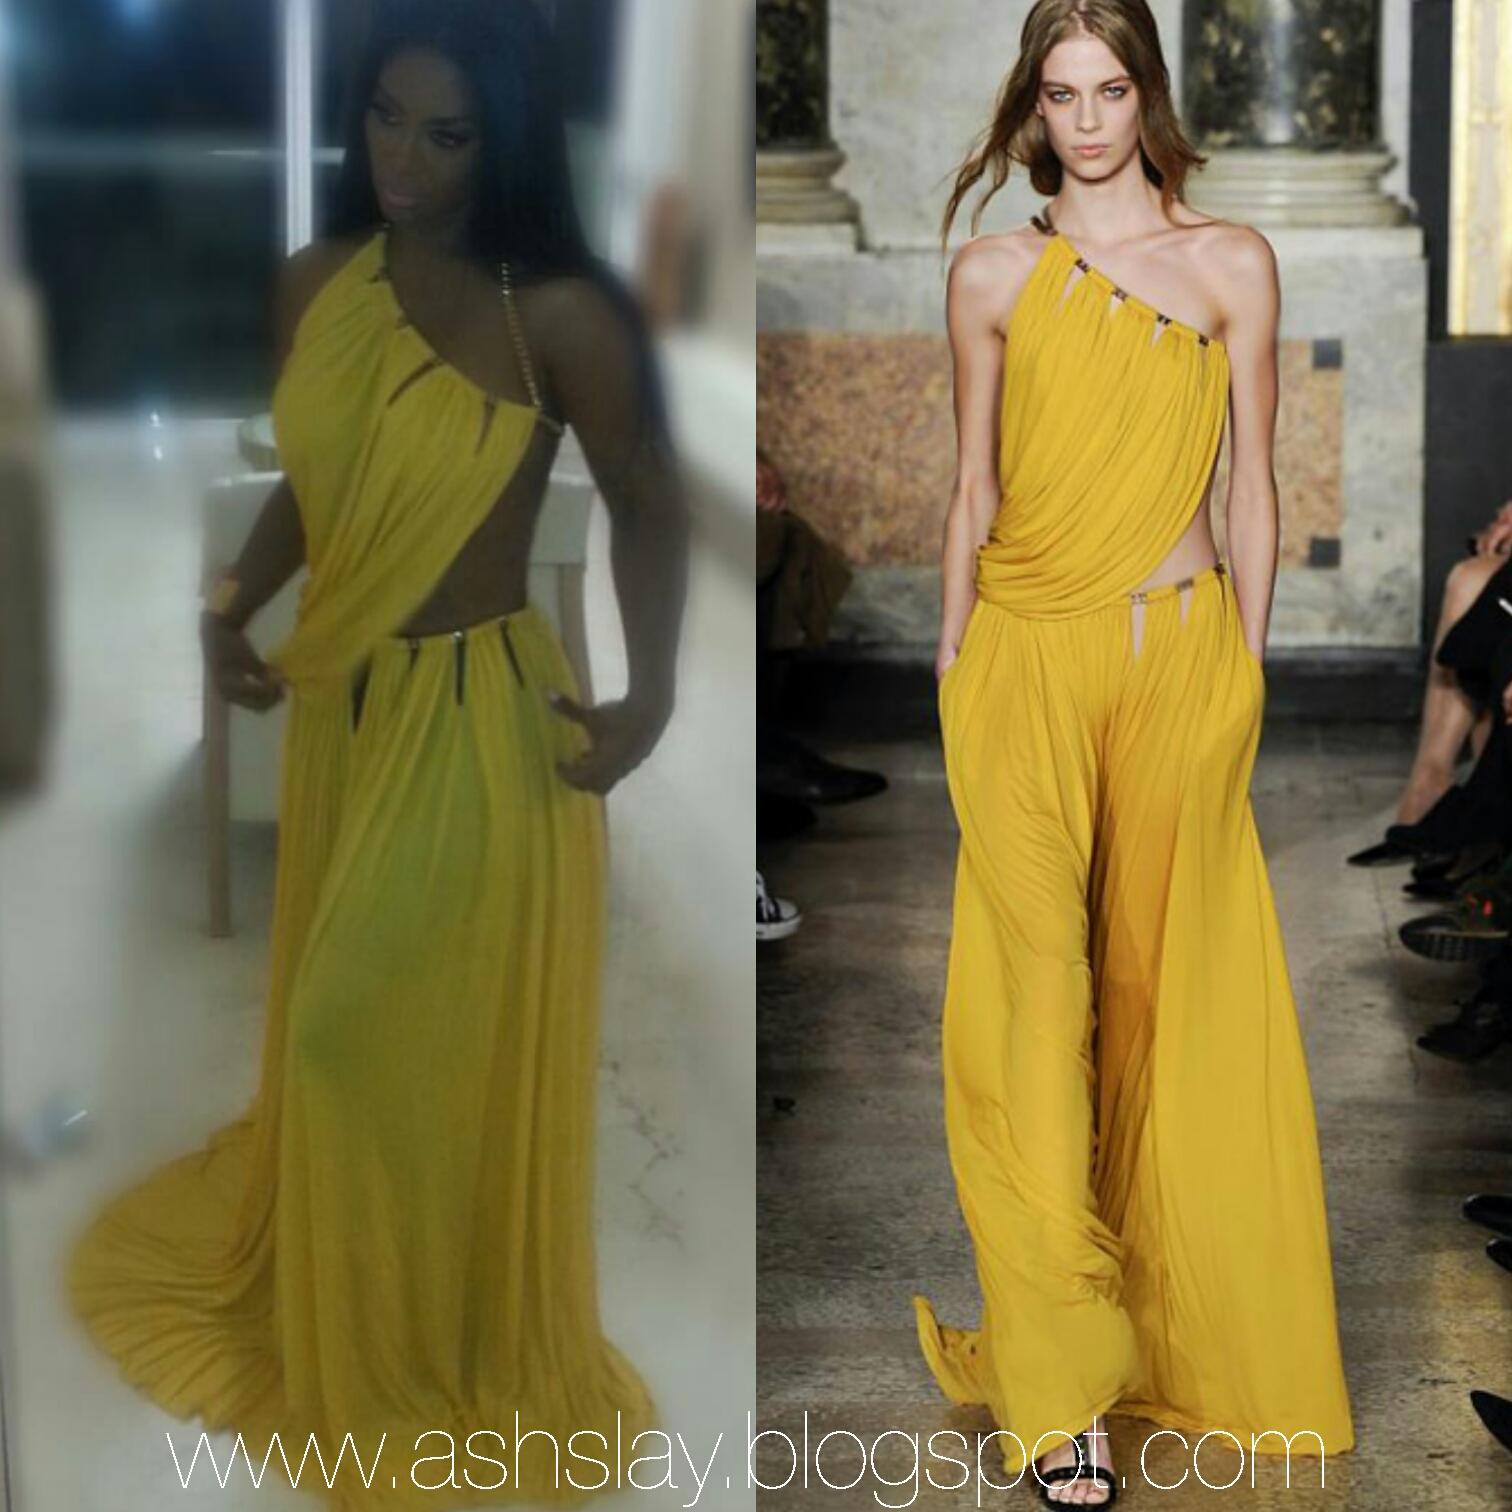 Style Breakdown Rhoa Kenya Moore Wearing Emilio Pucci Dress